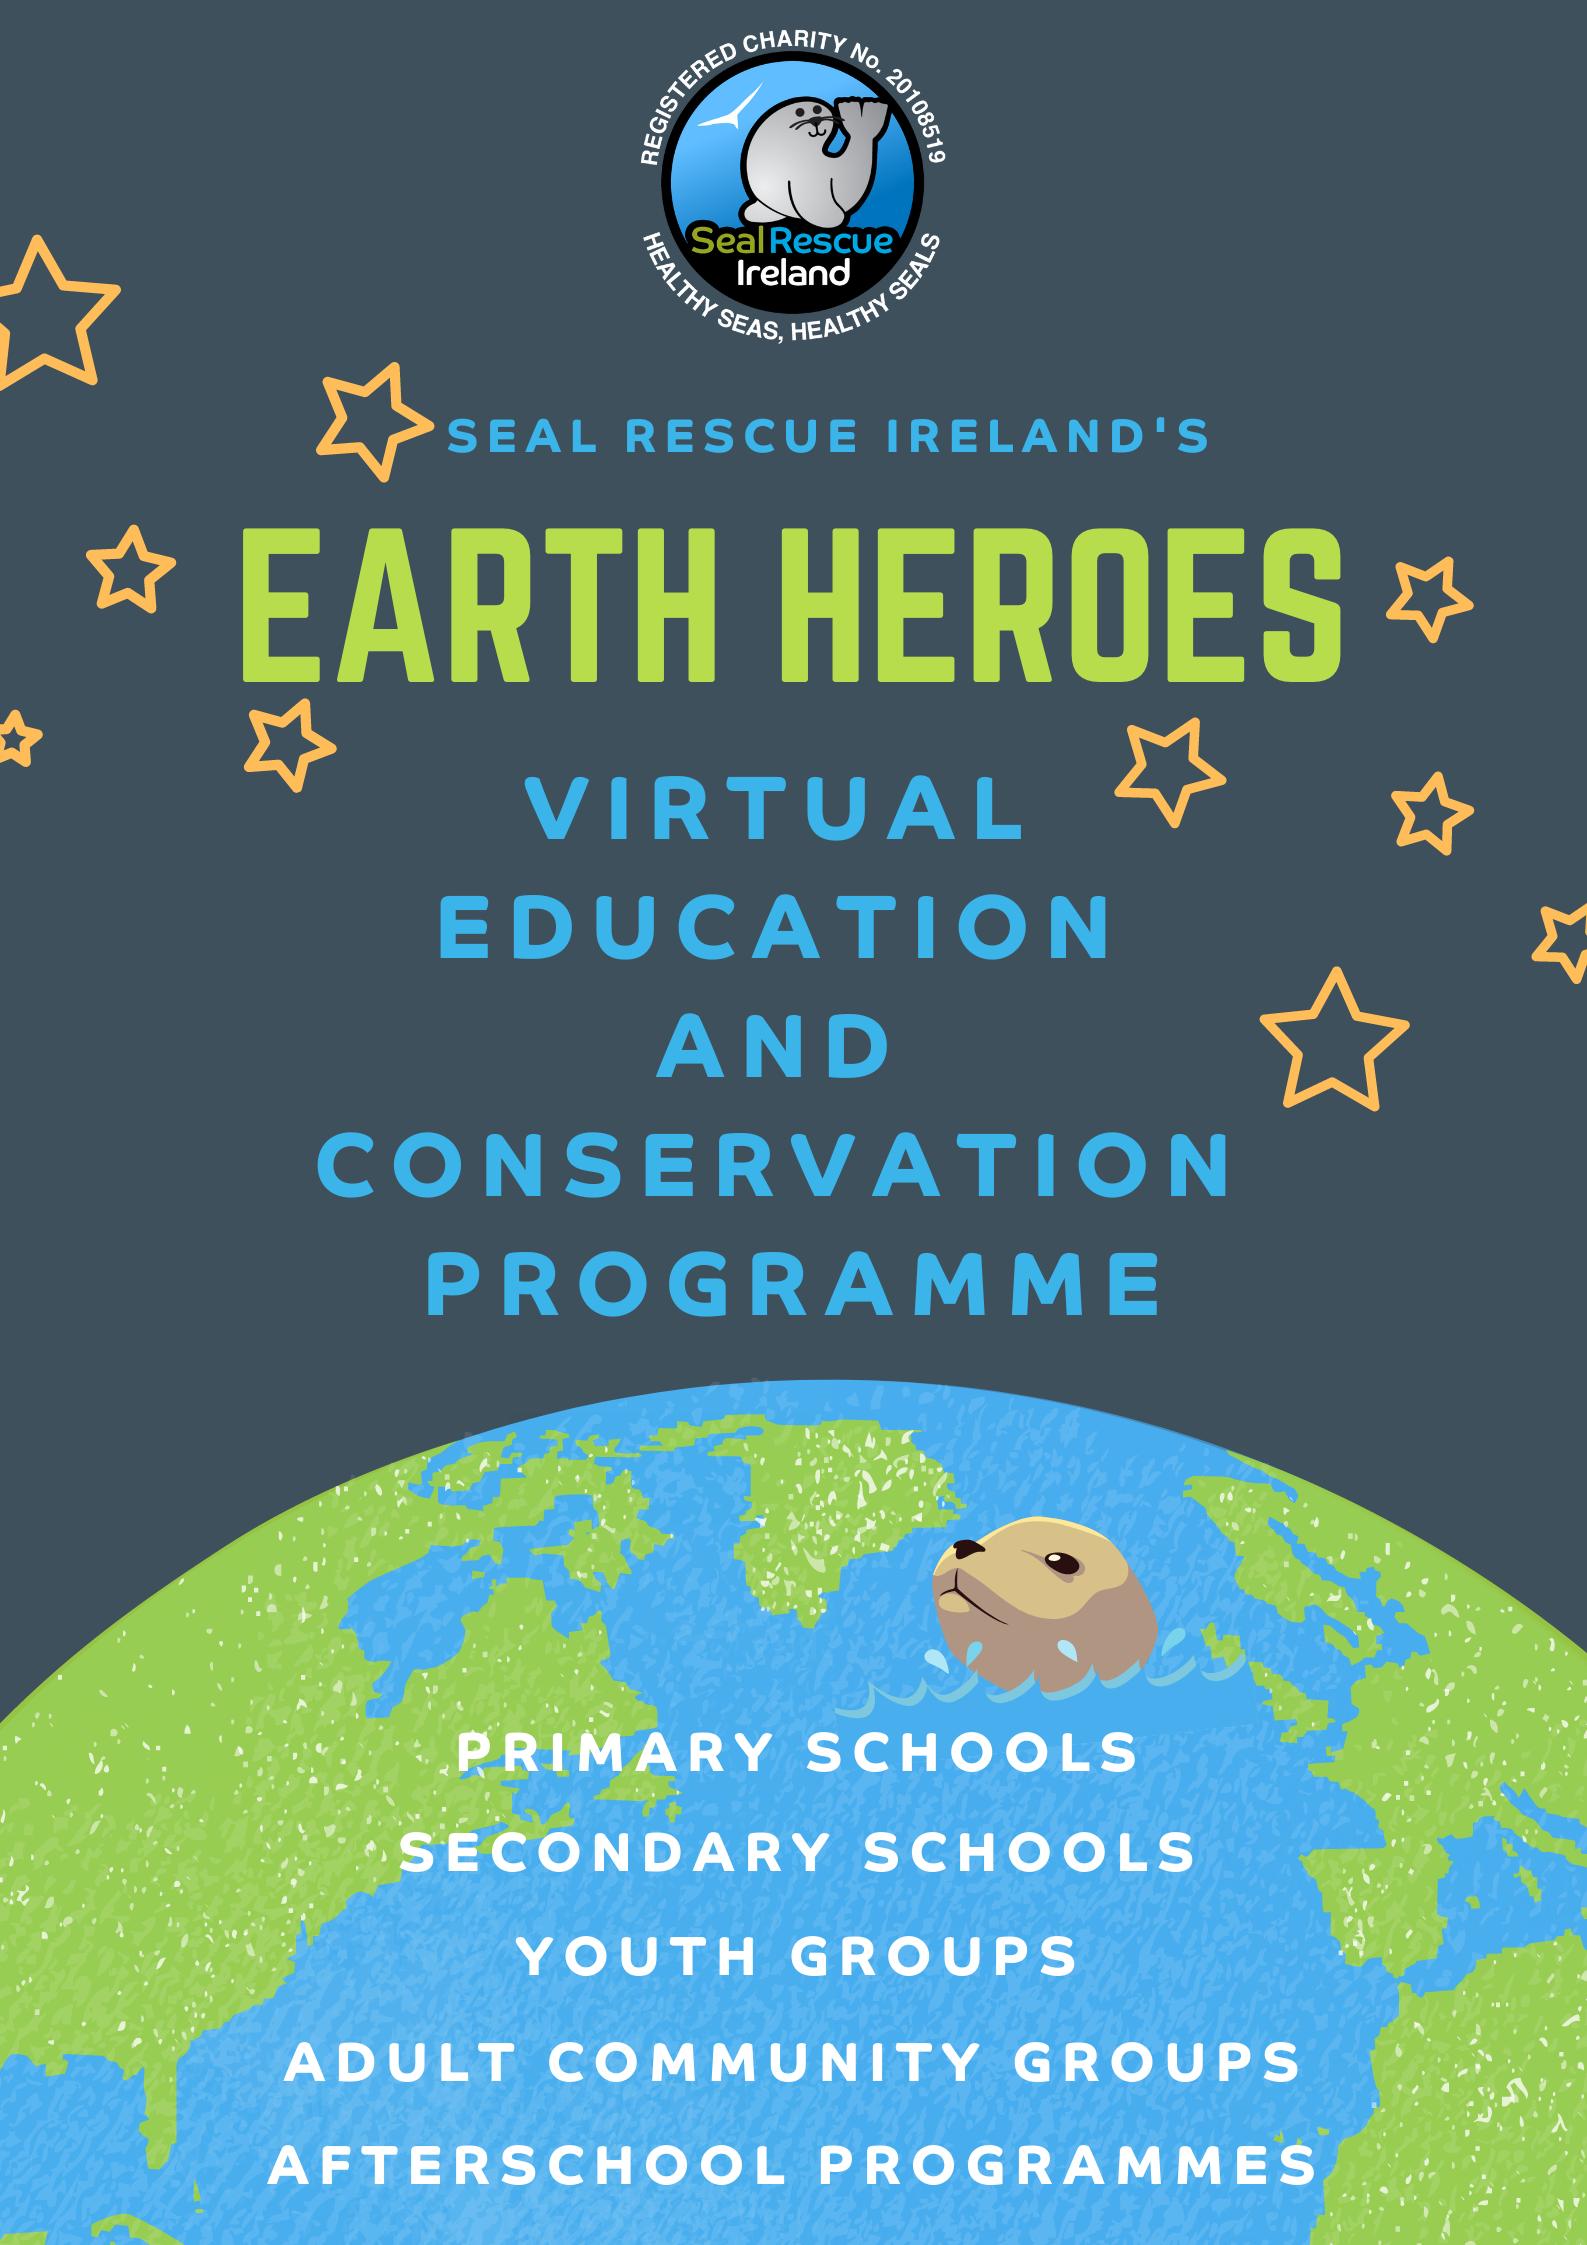 SRI's Earth Heros Online Education Programme Poster